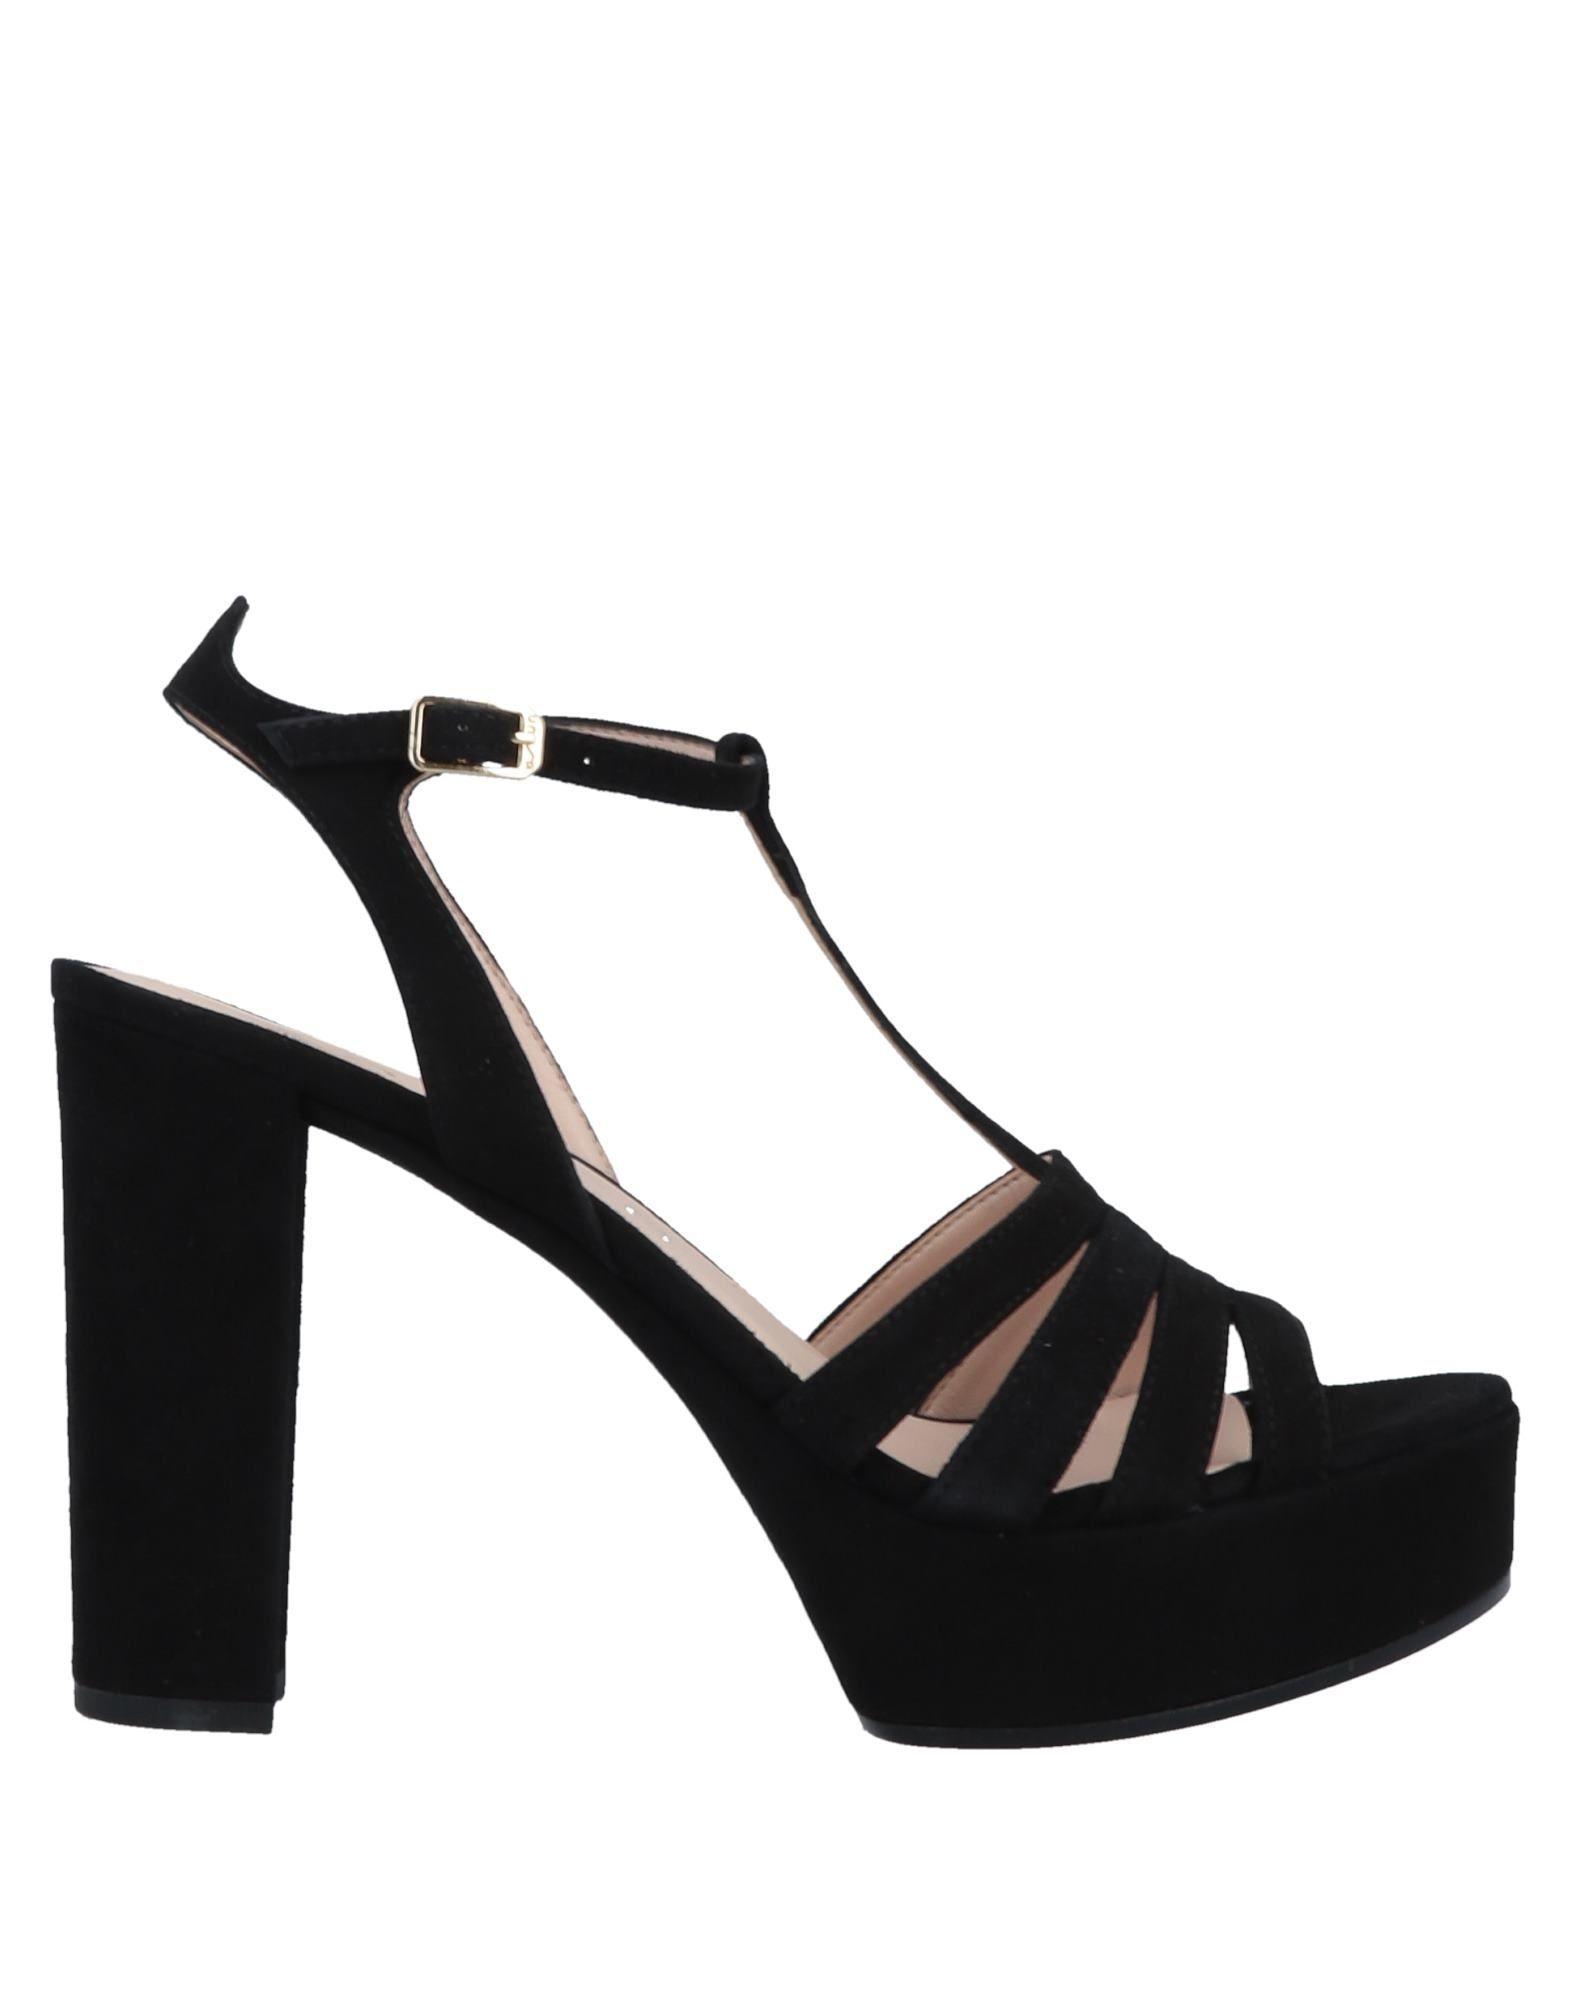 d6ef803e0bef Unisa Sandals in Black - Lyst